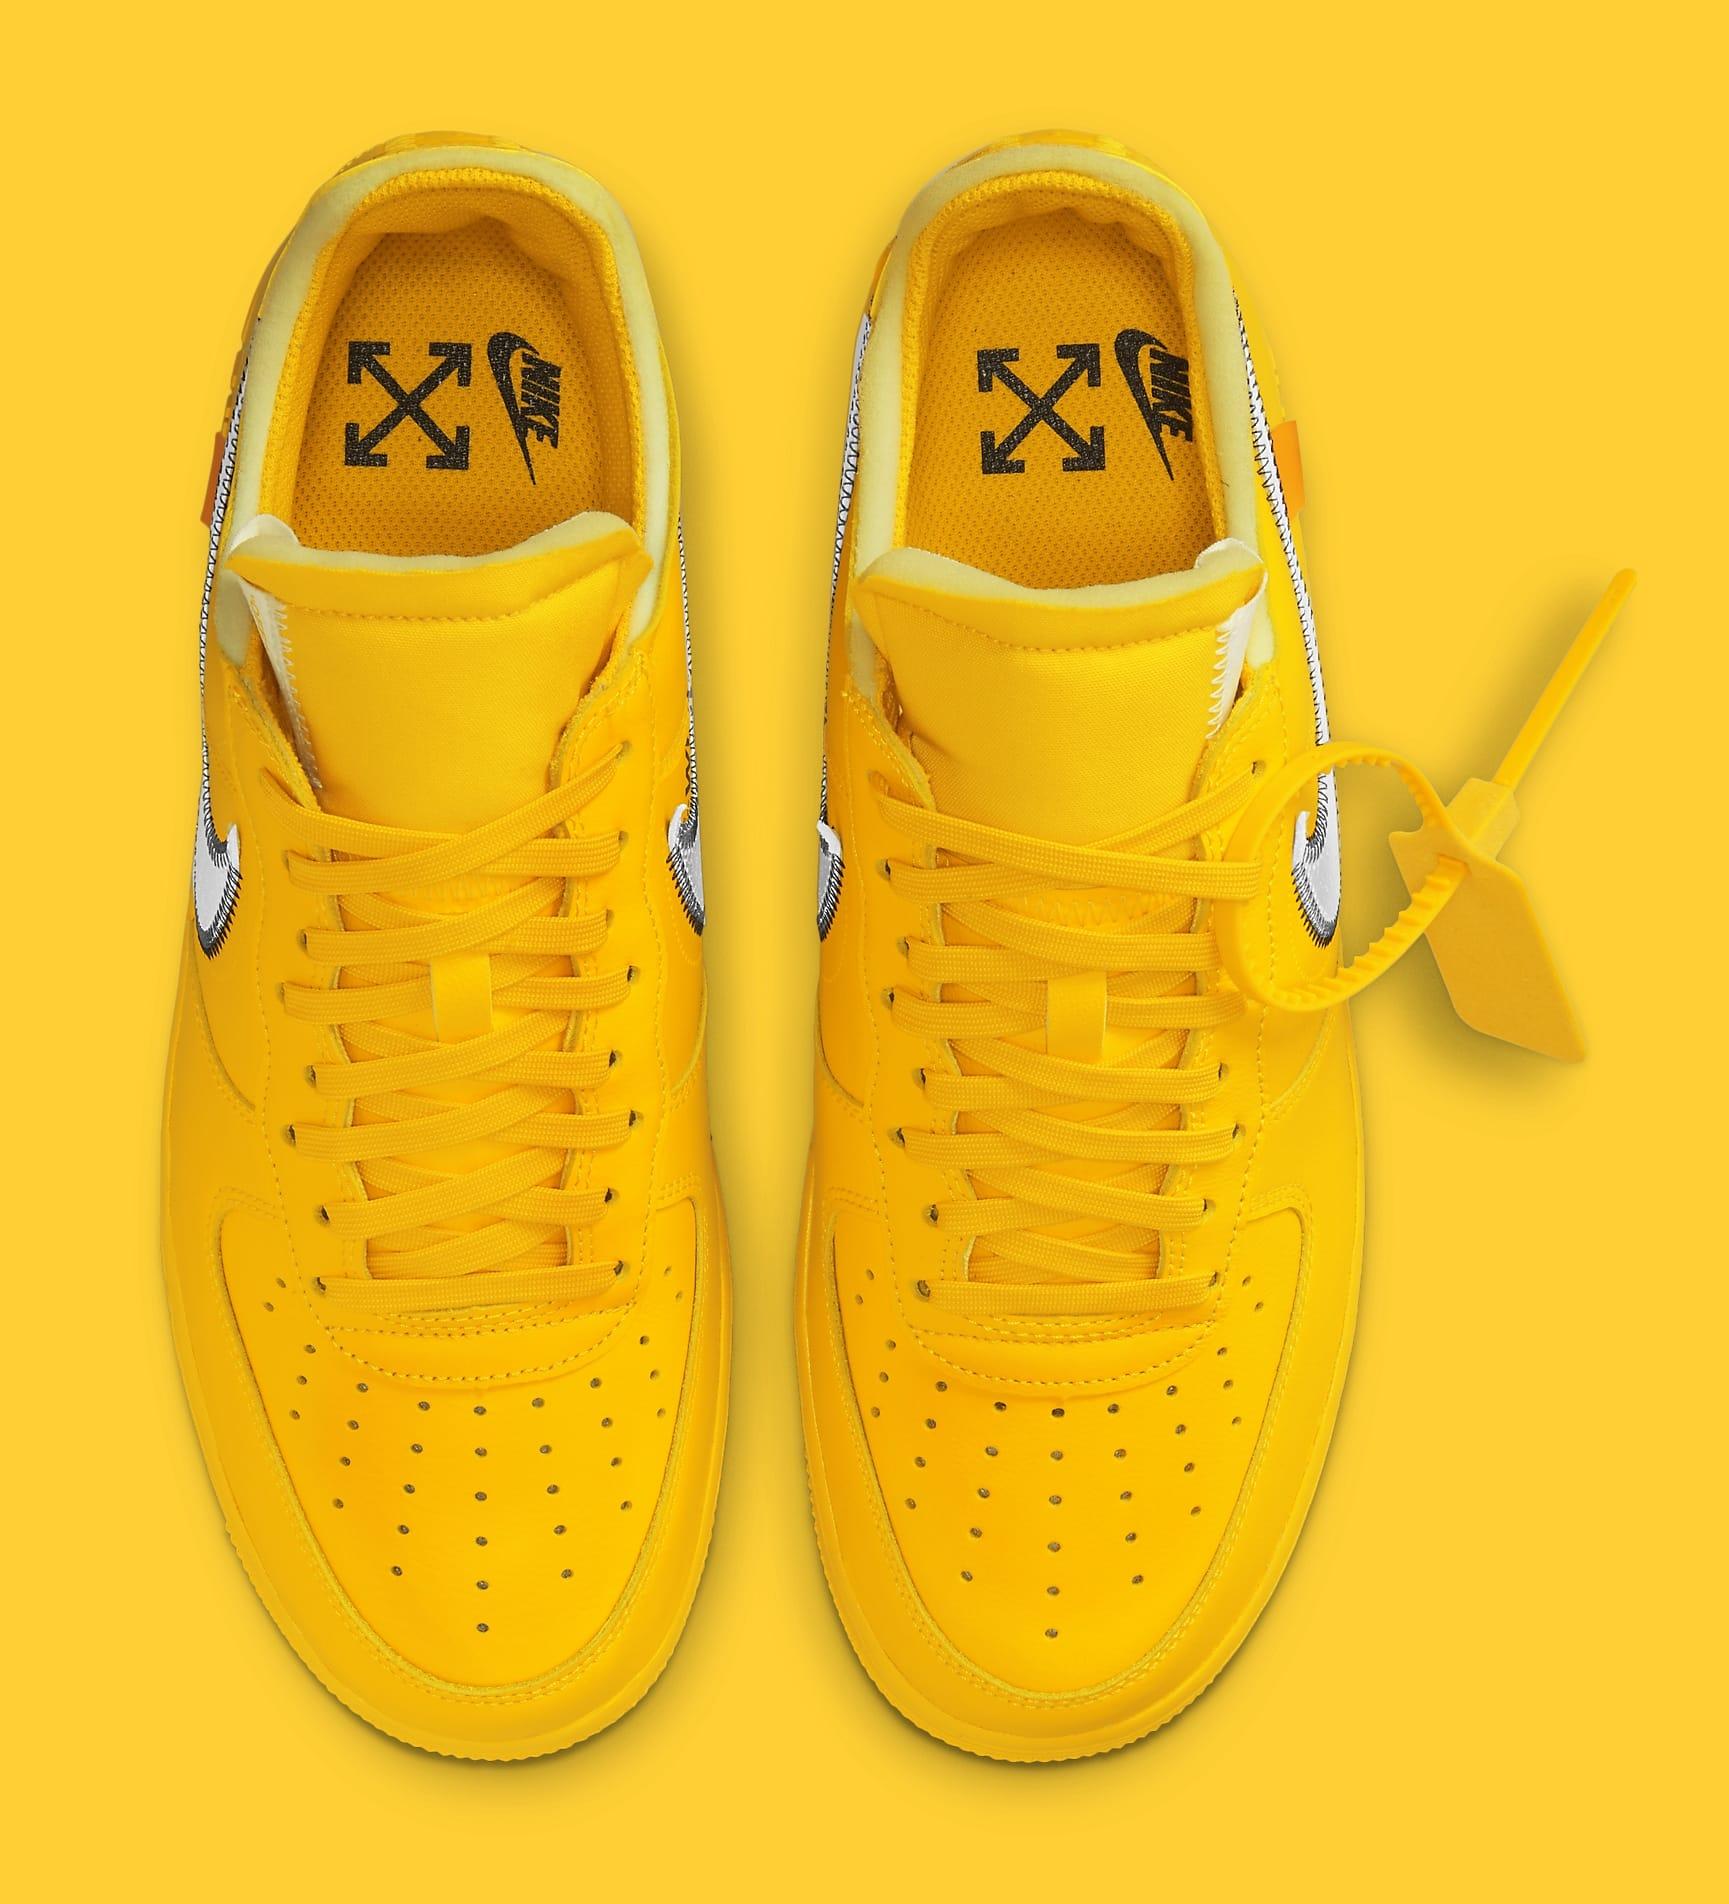 Off-White x Nike Air Force 1 Low 'Lemonade' DD1876-700 Top